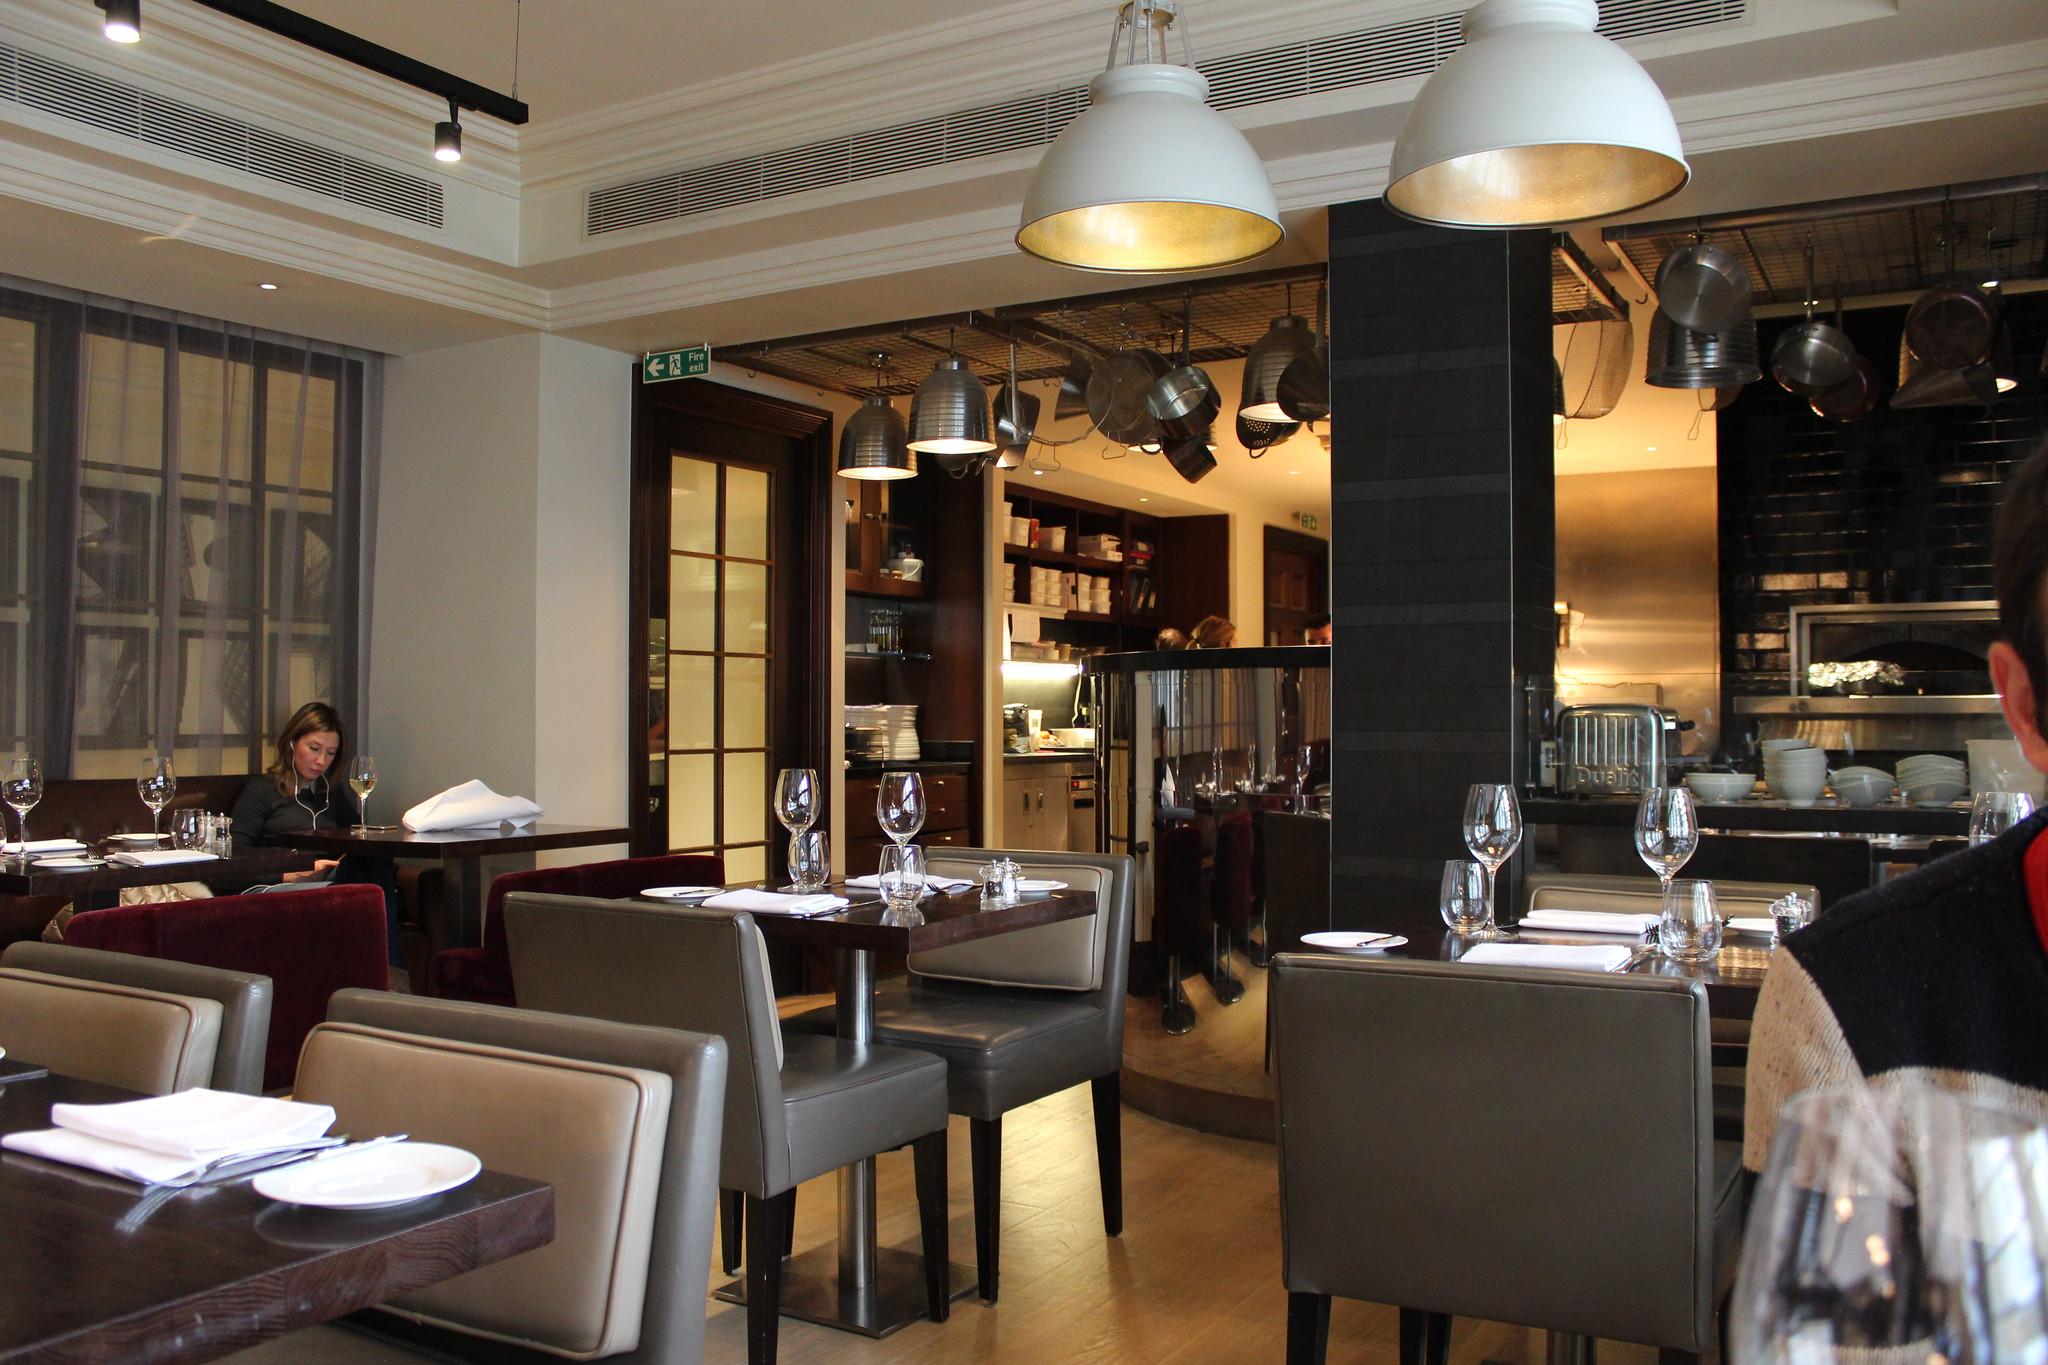 12 interior Hunter 486 The Arch London Restaurant Review FoodFashFit (8)